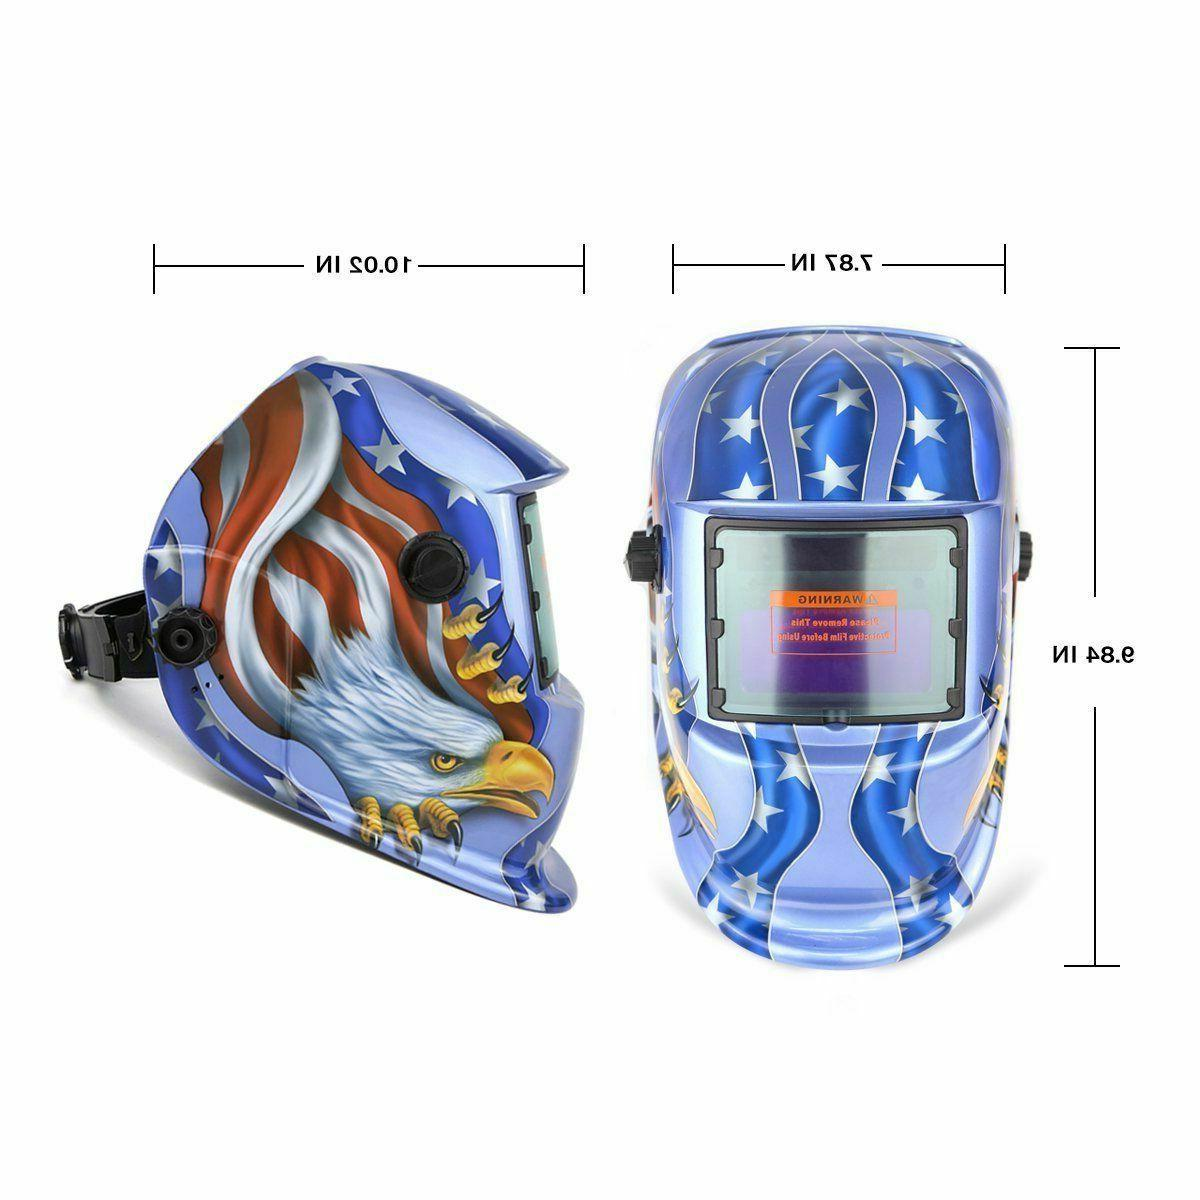 DEKO Solar Welding Helmet Tig Arc Mask Grinding Mask